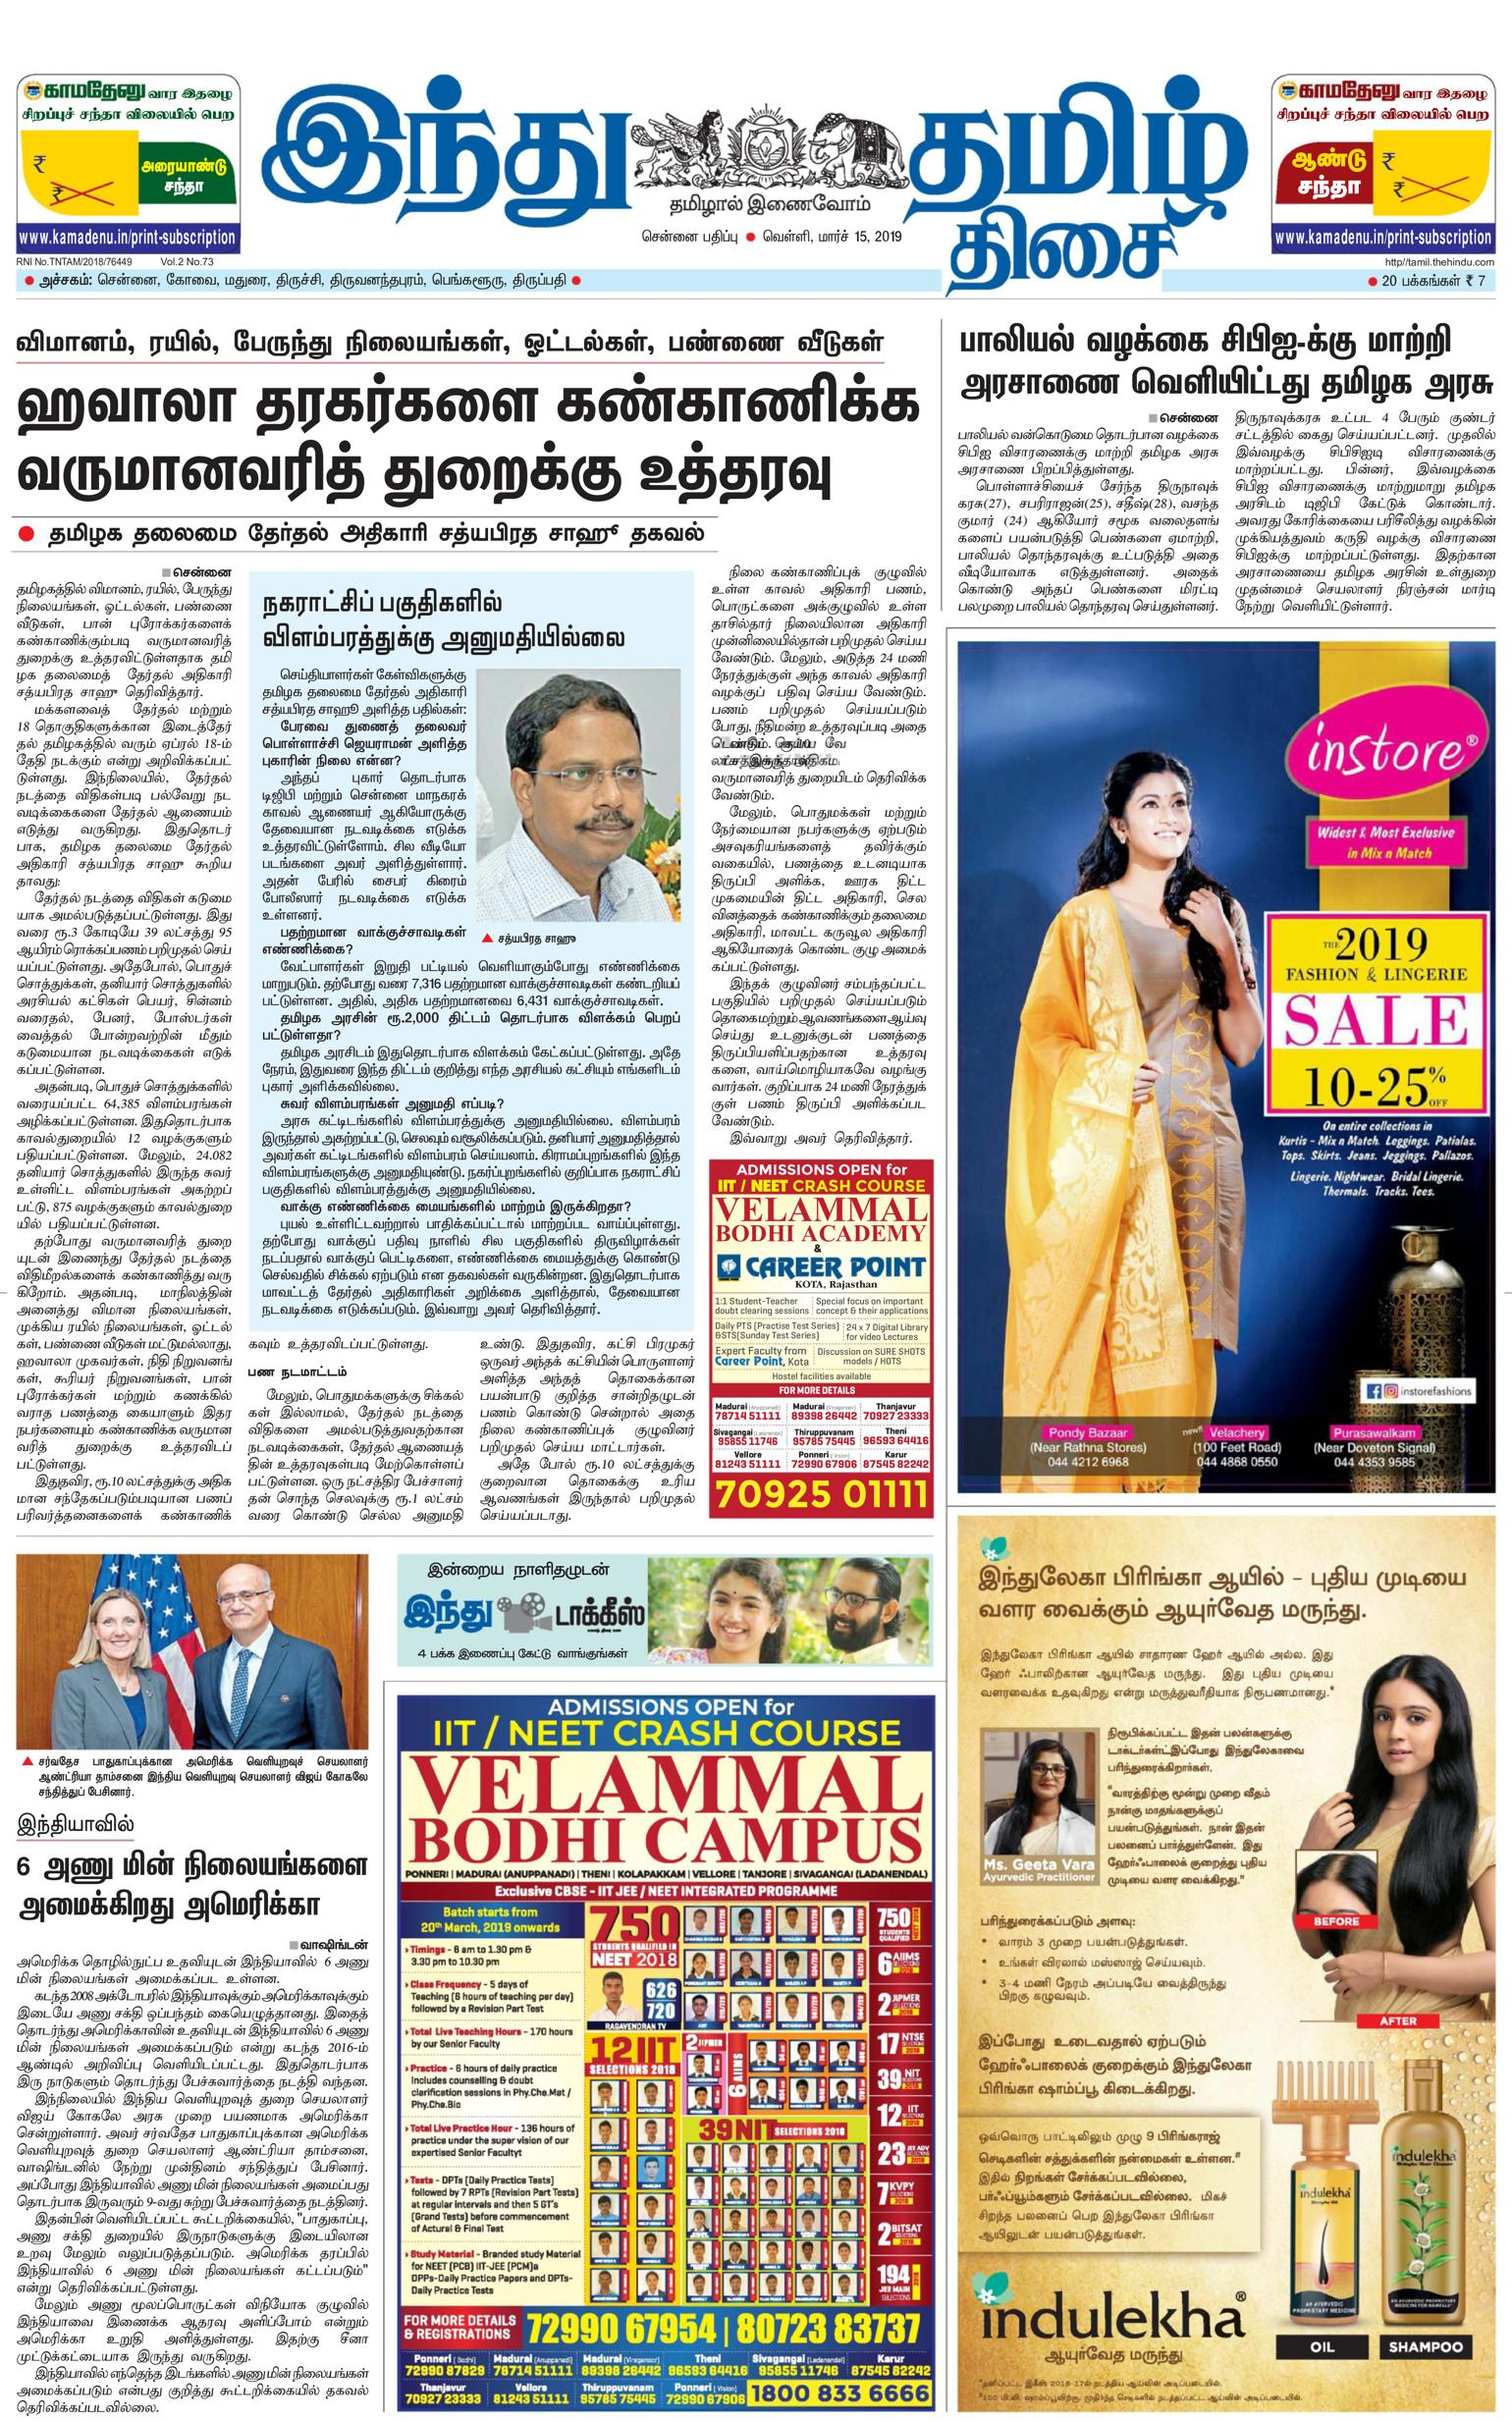 The Hindu Tamil - மார்ச் 15, 2019